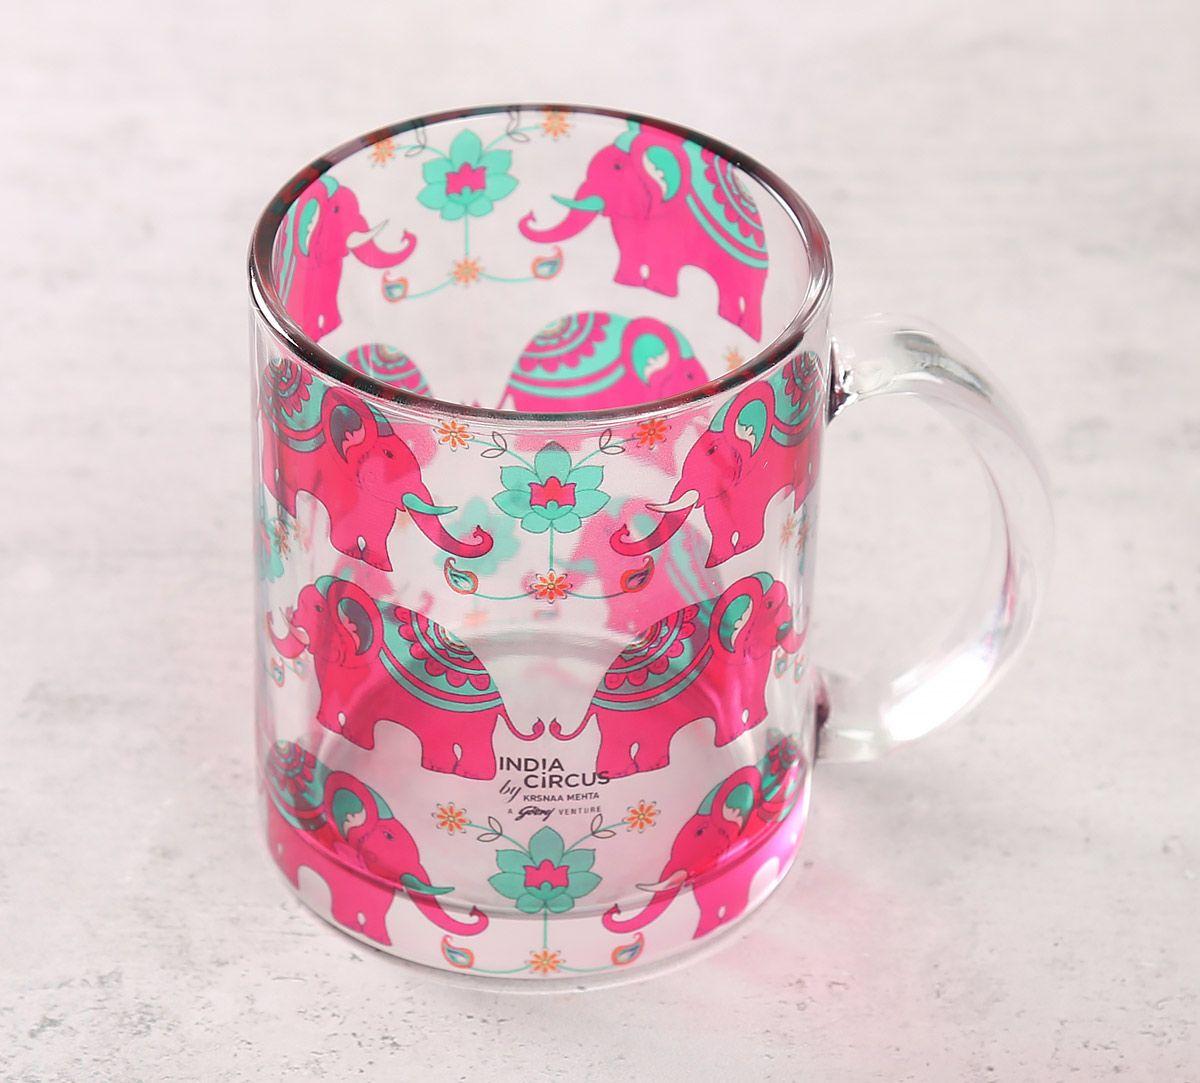 India Circus Violet Mastodon's Jamboree Glass Mug